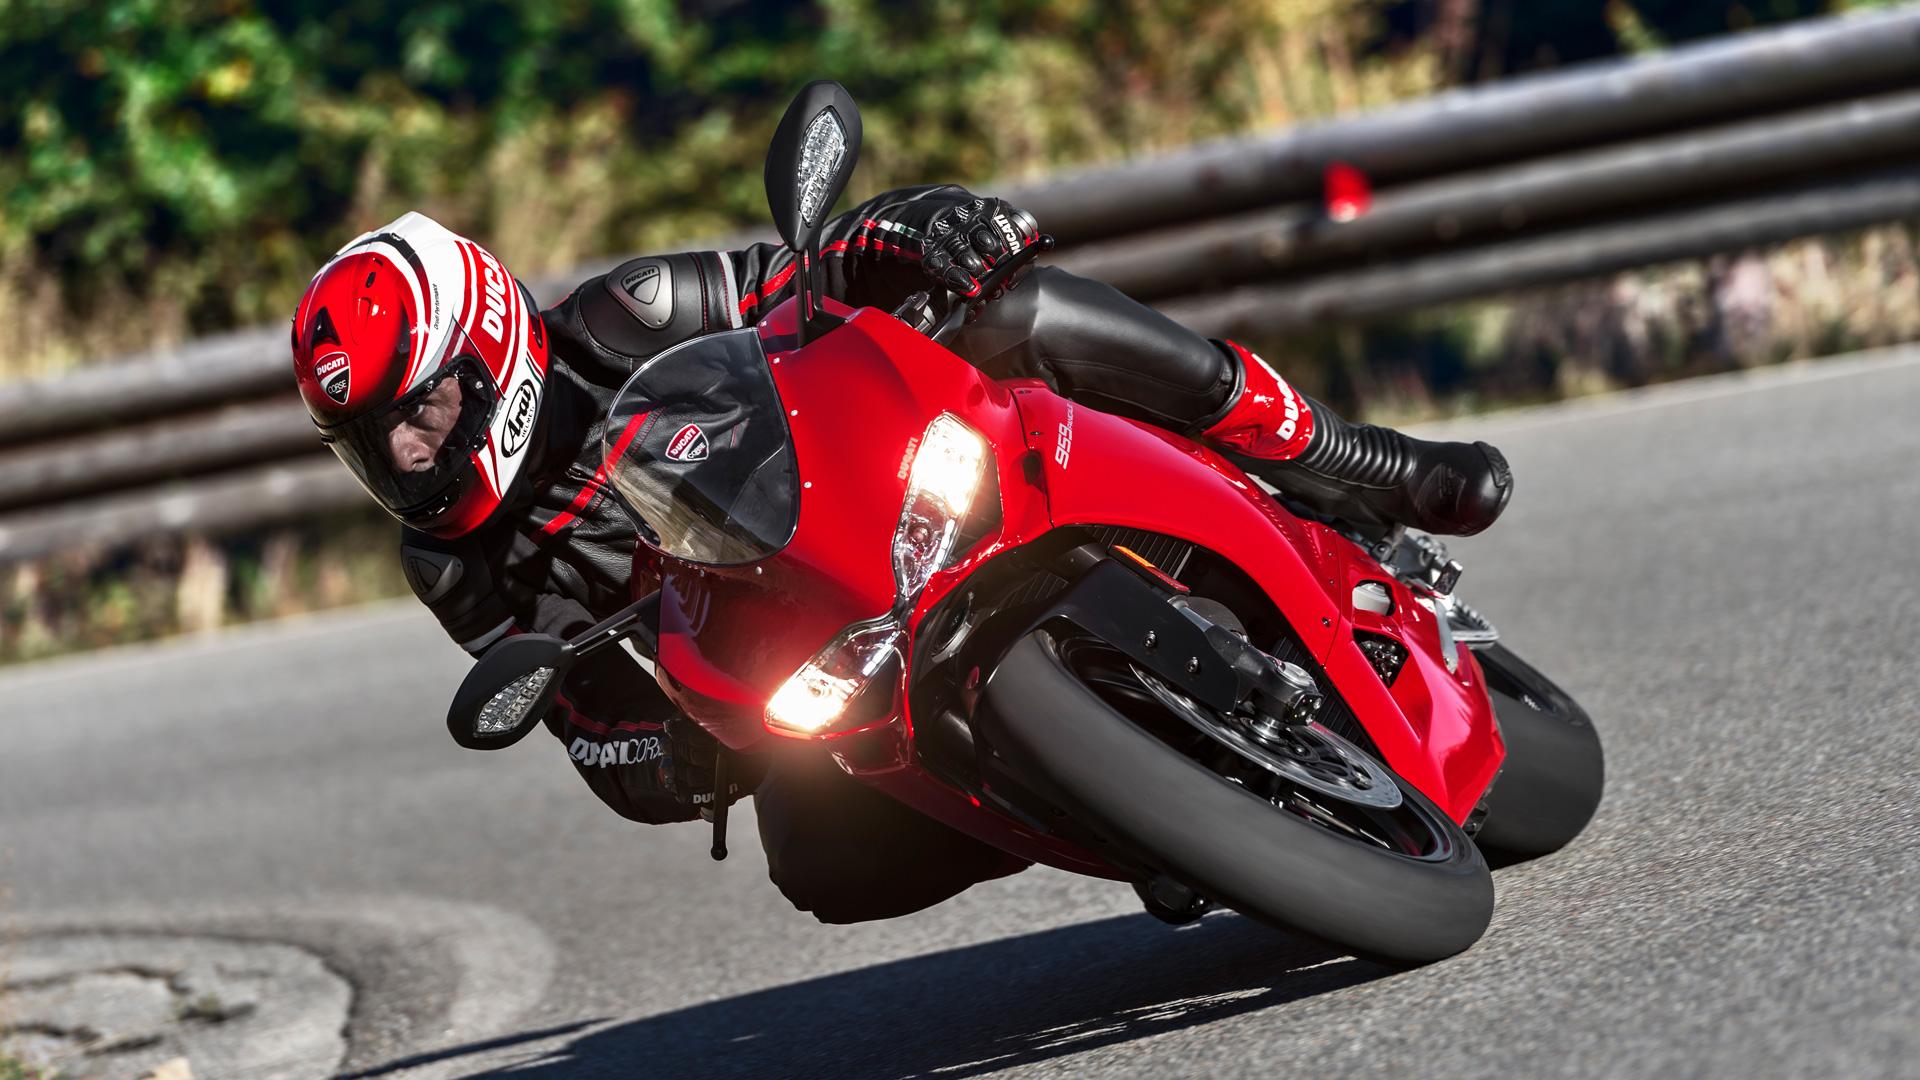 Ducati Superbike 959 Panigale Racing Attitude